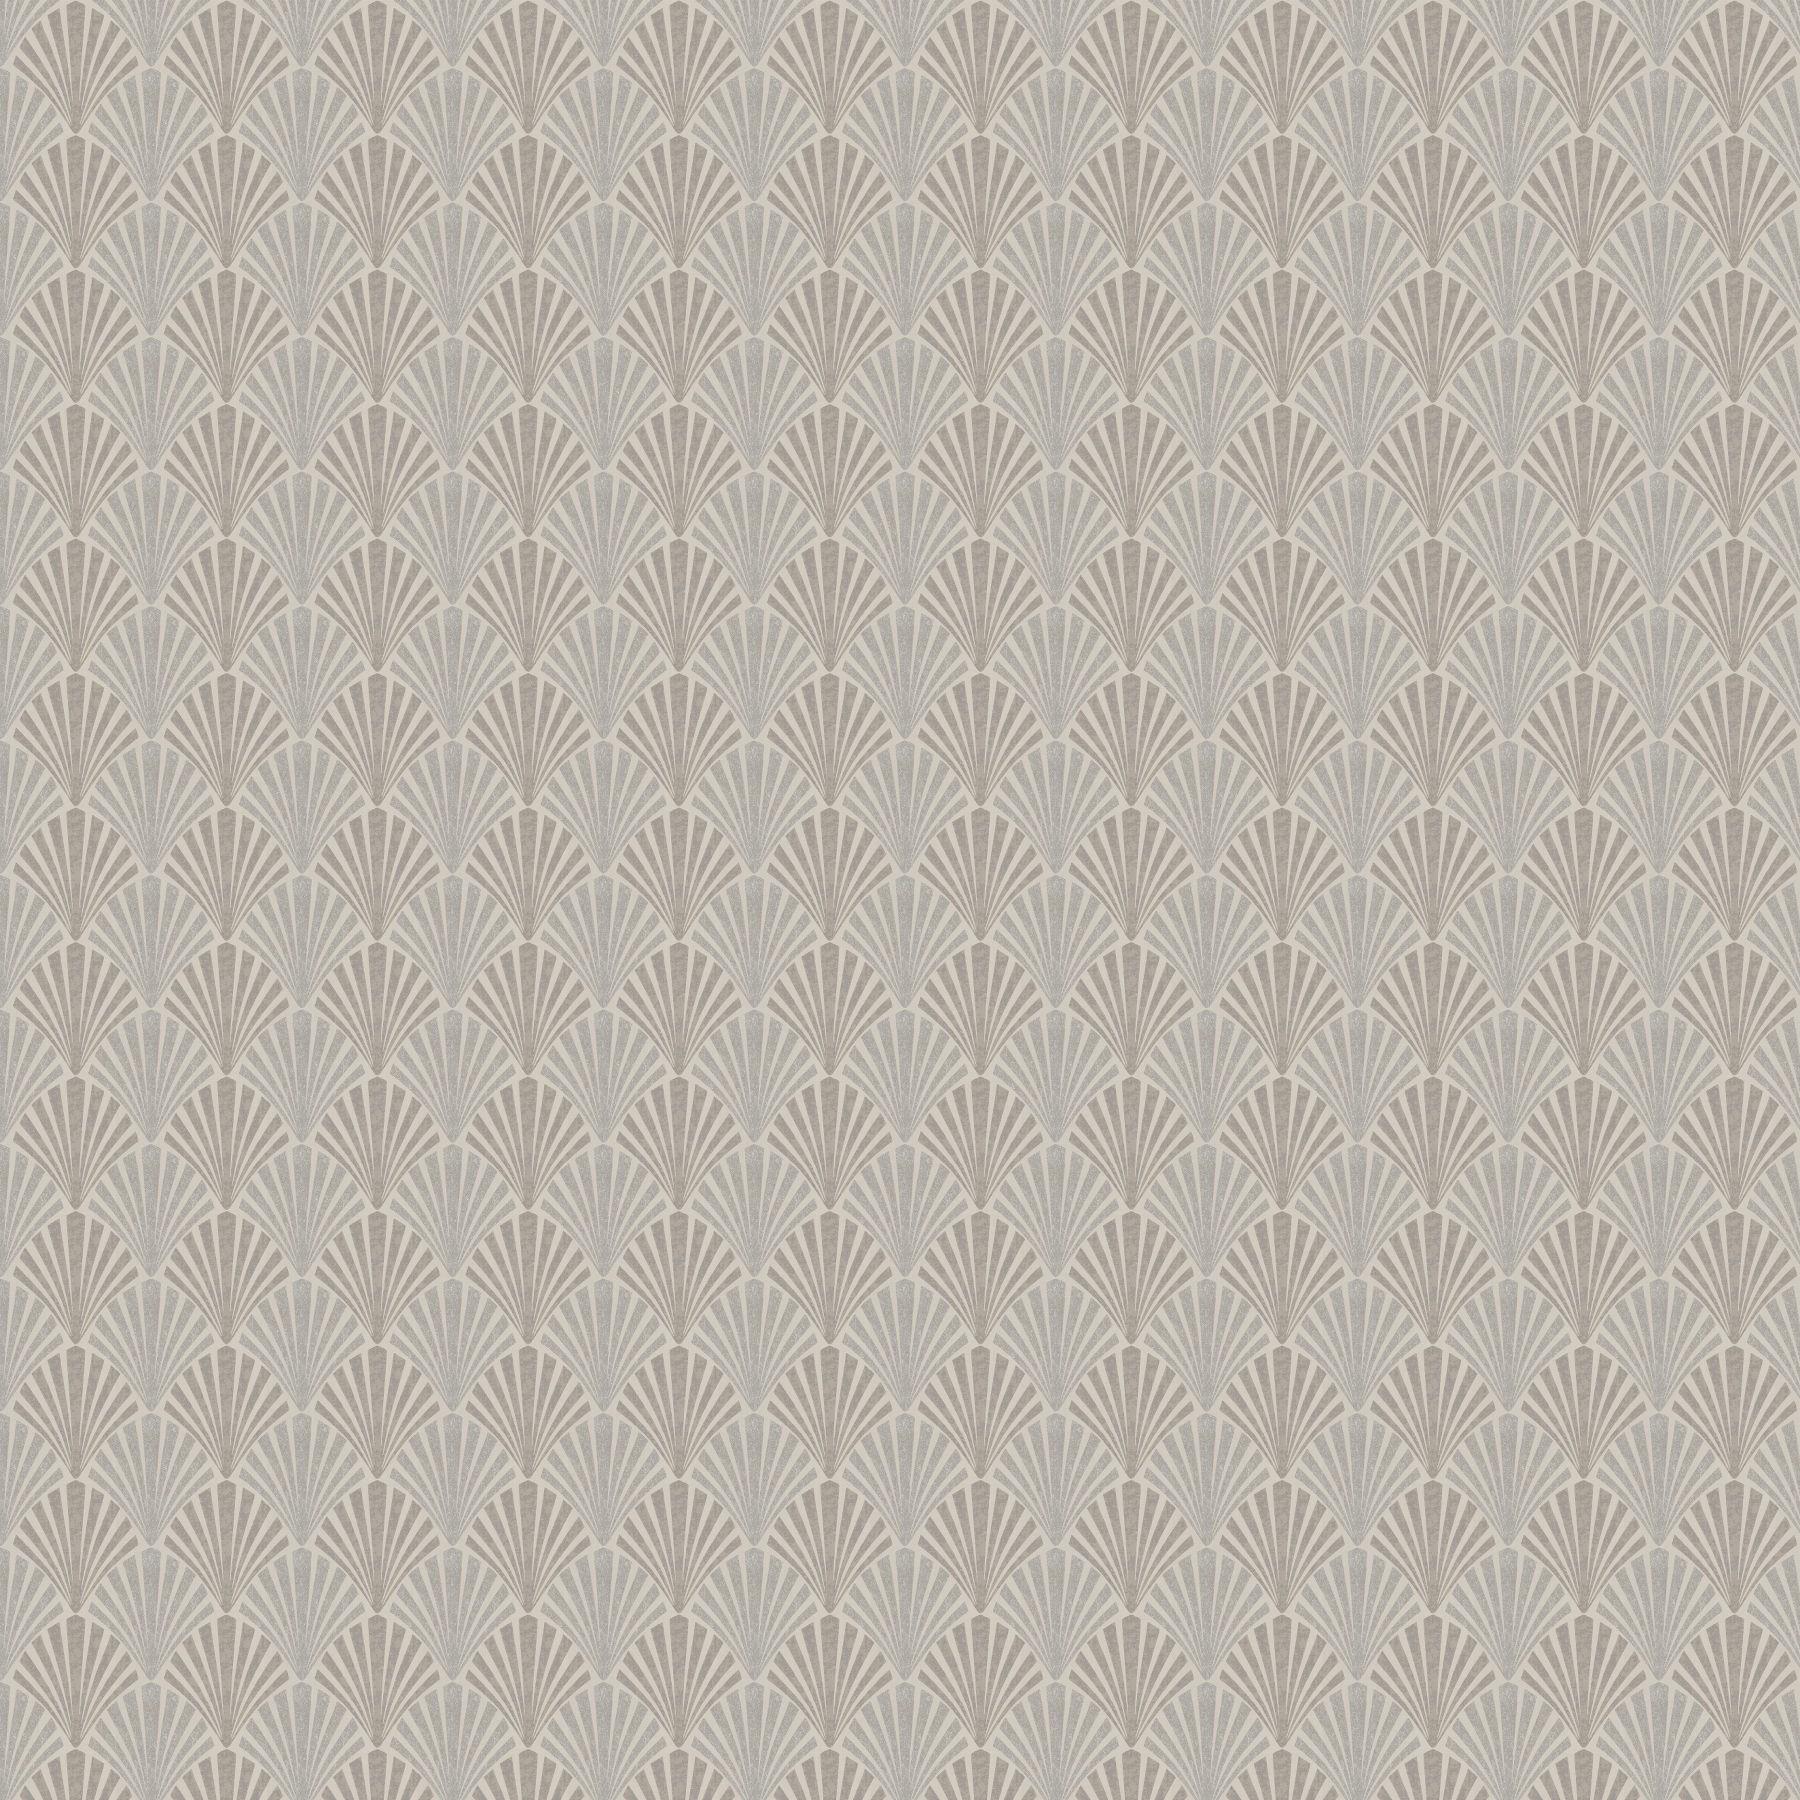 wallpapers swing 4 4049 091 jab anstoetz fabrics. Black Bedroom Furniture Sets. Home Design Ideas